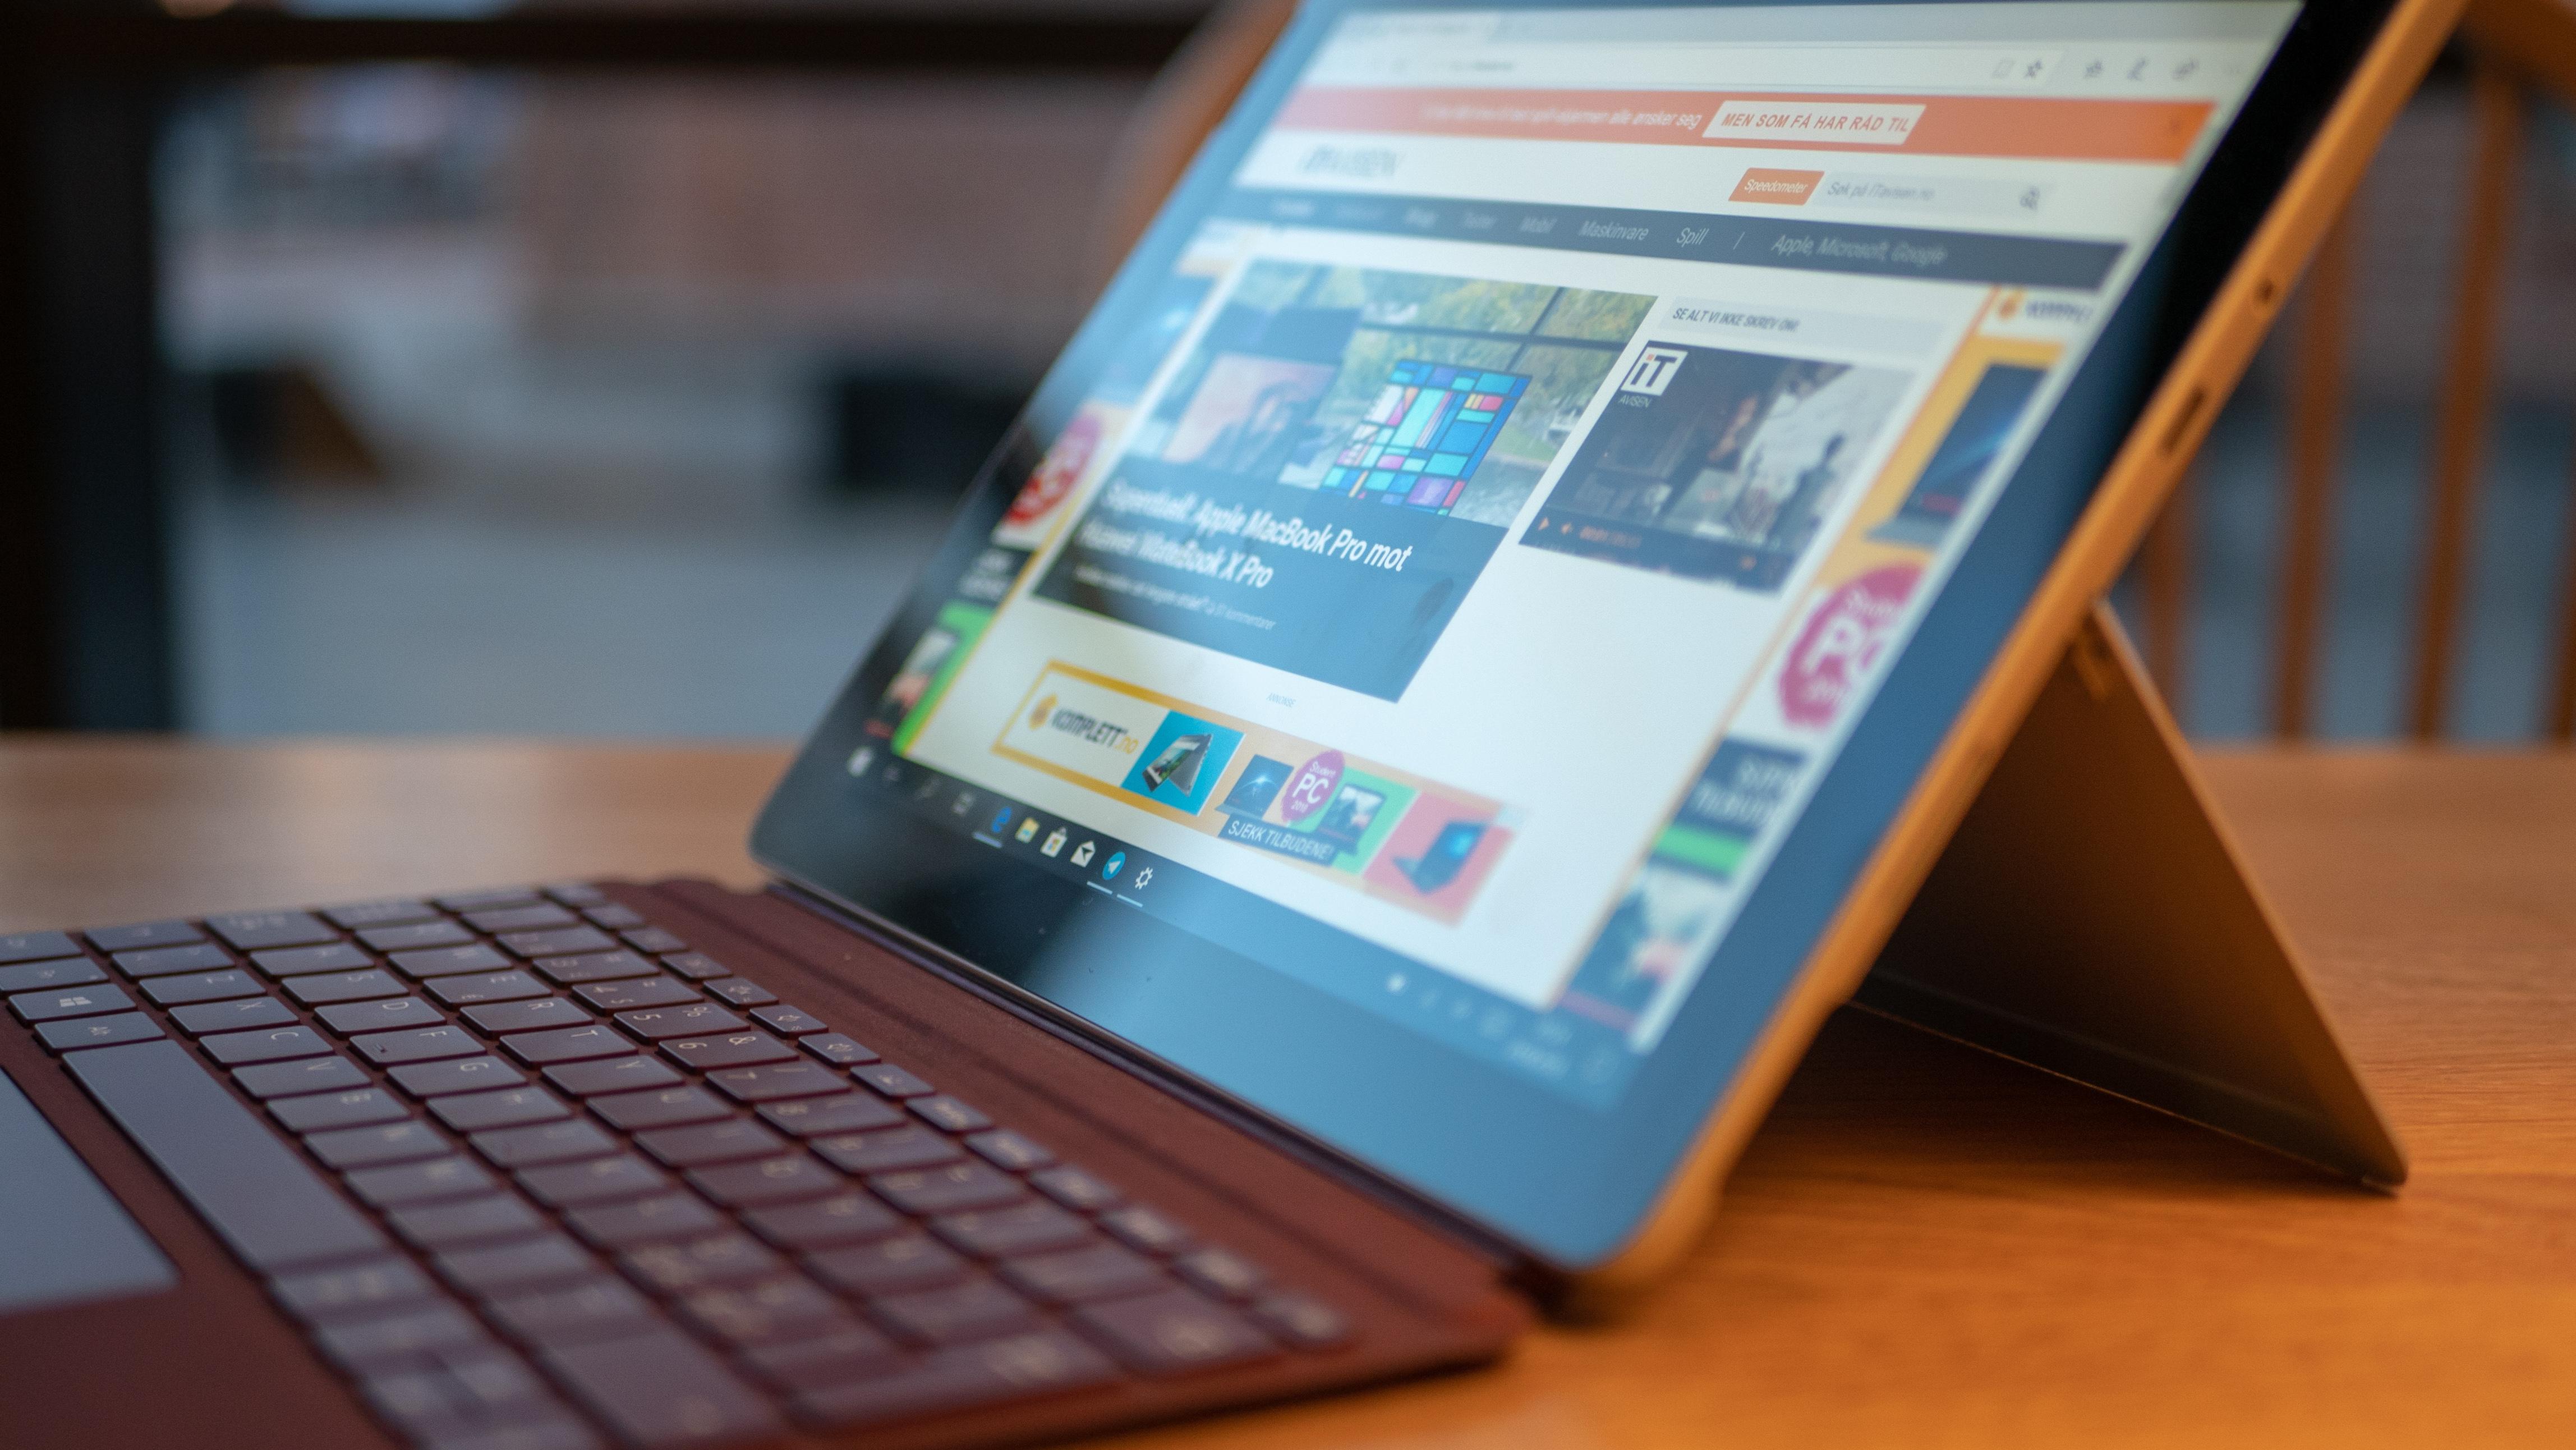 Vi er ganske spent på hvor godt Surface Go presterer.